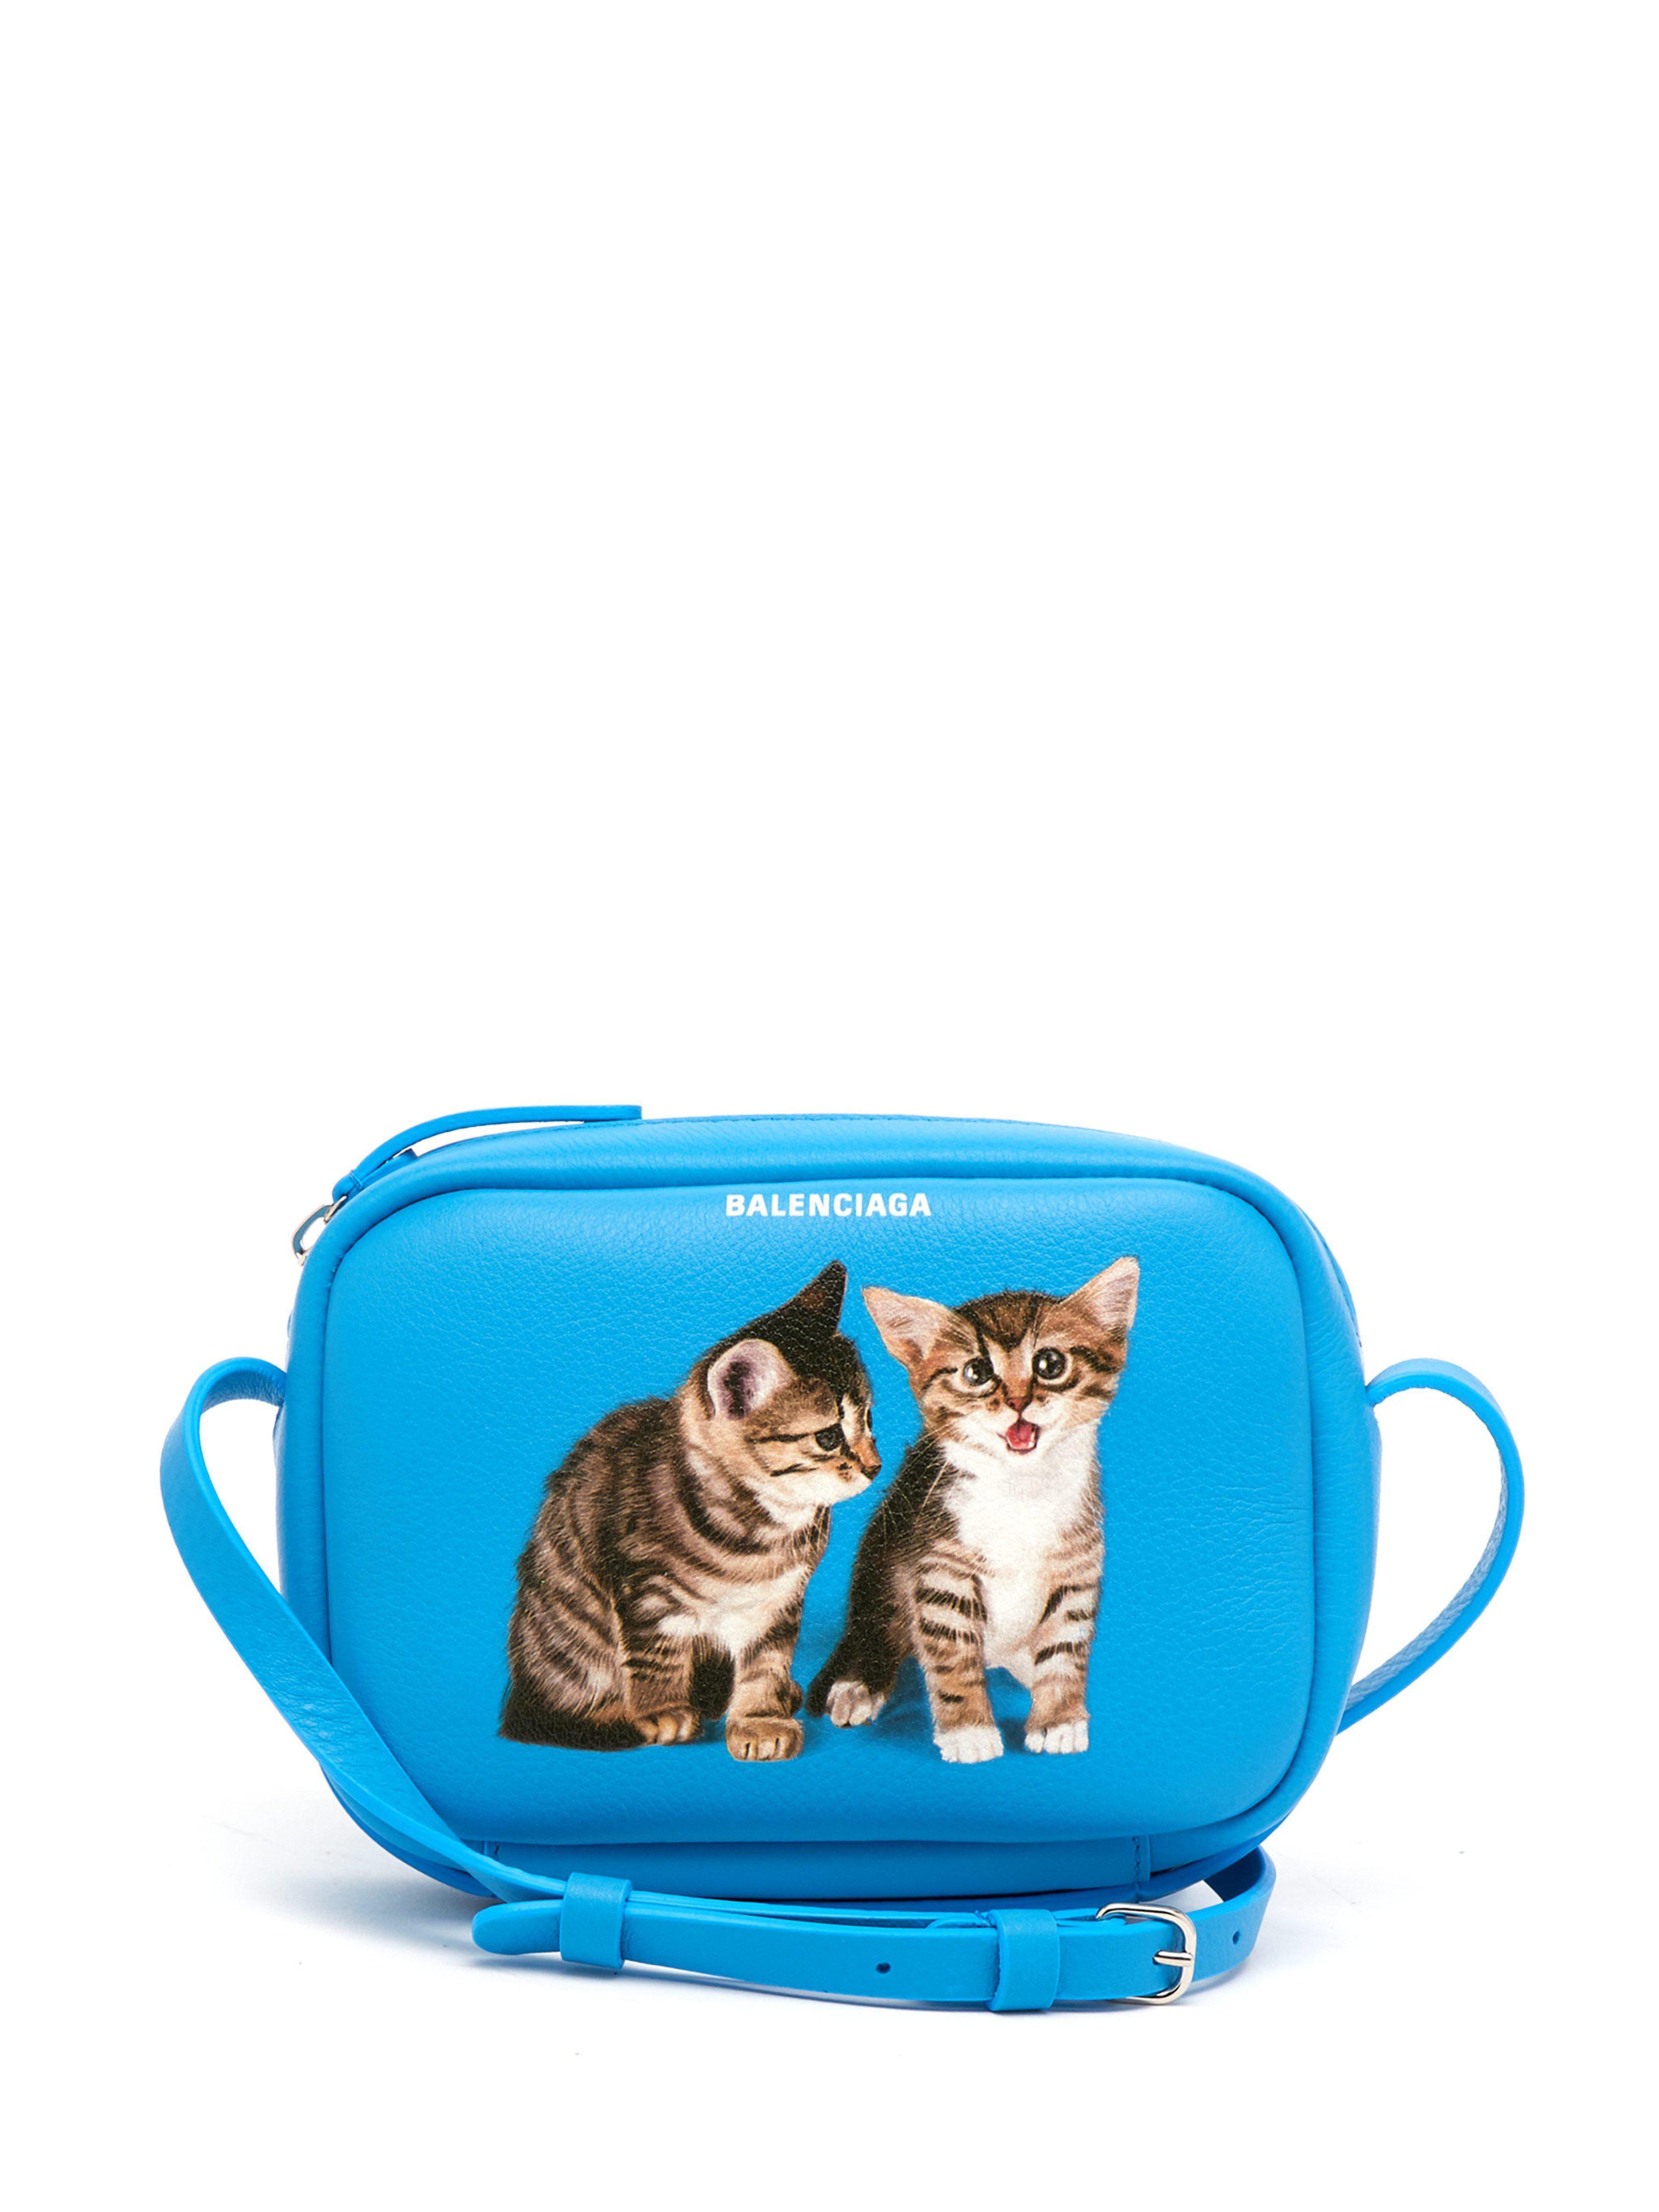 Everyday Camera Xs Kitten Print Cross Body Bag Blue Balenciaga Shoulder Bags Tui Xach Tui